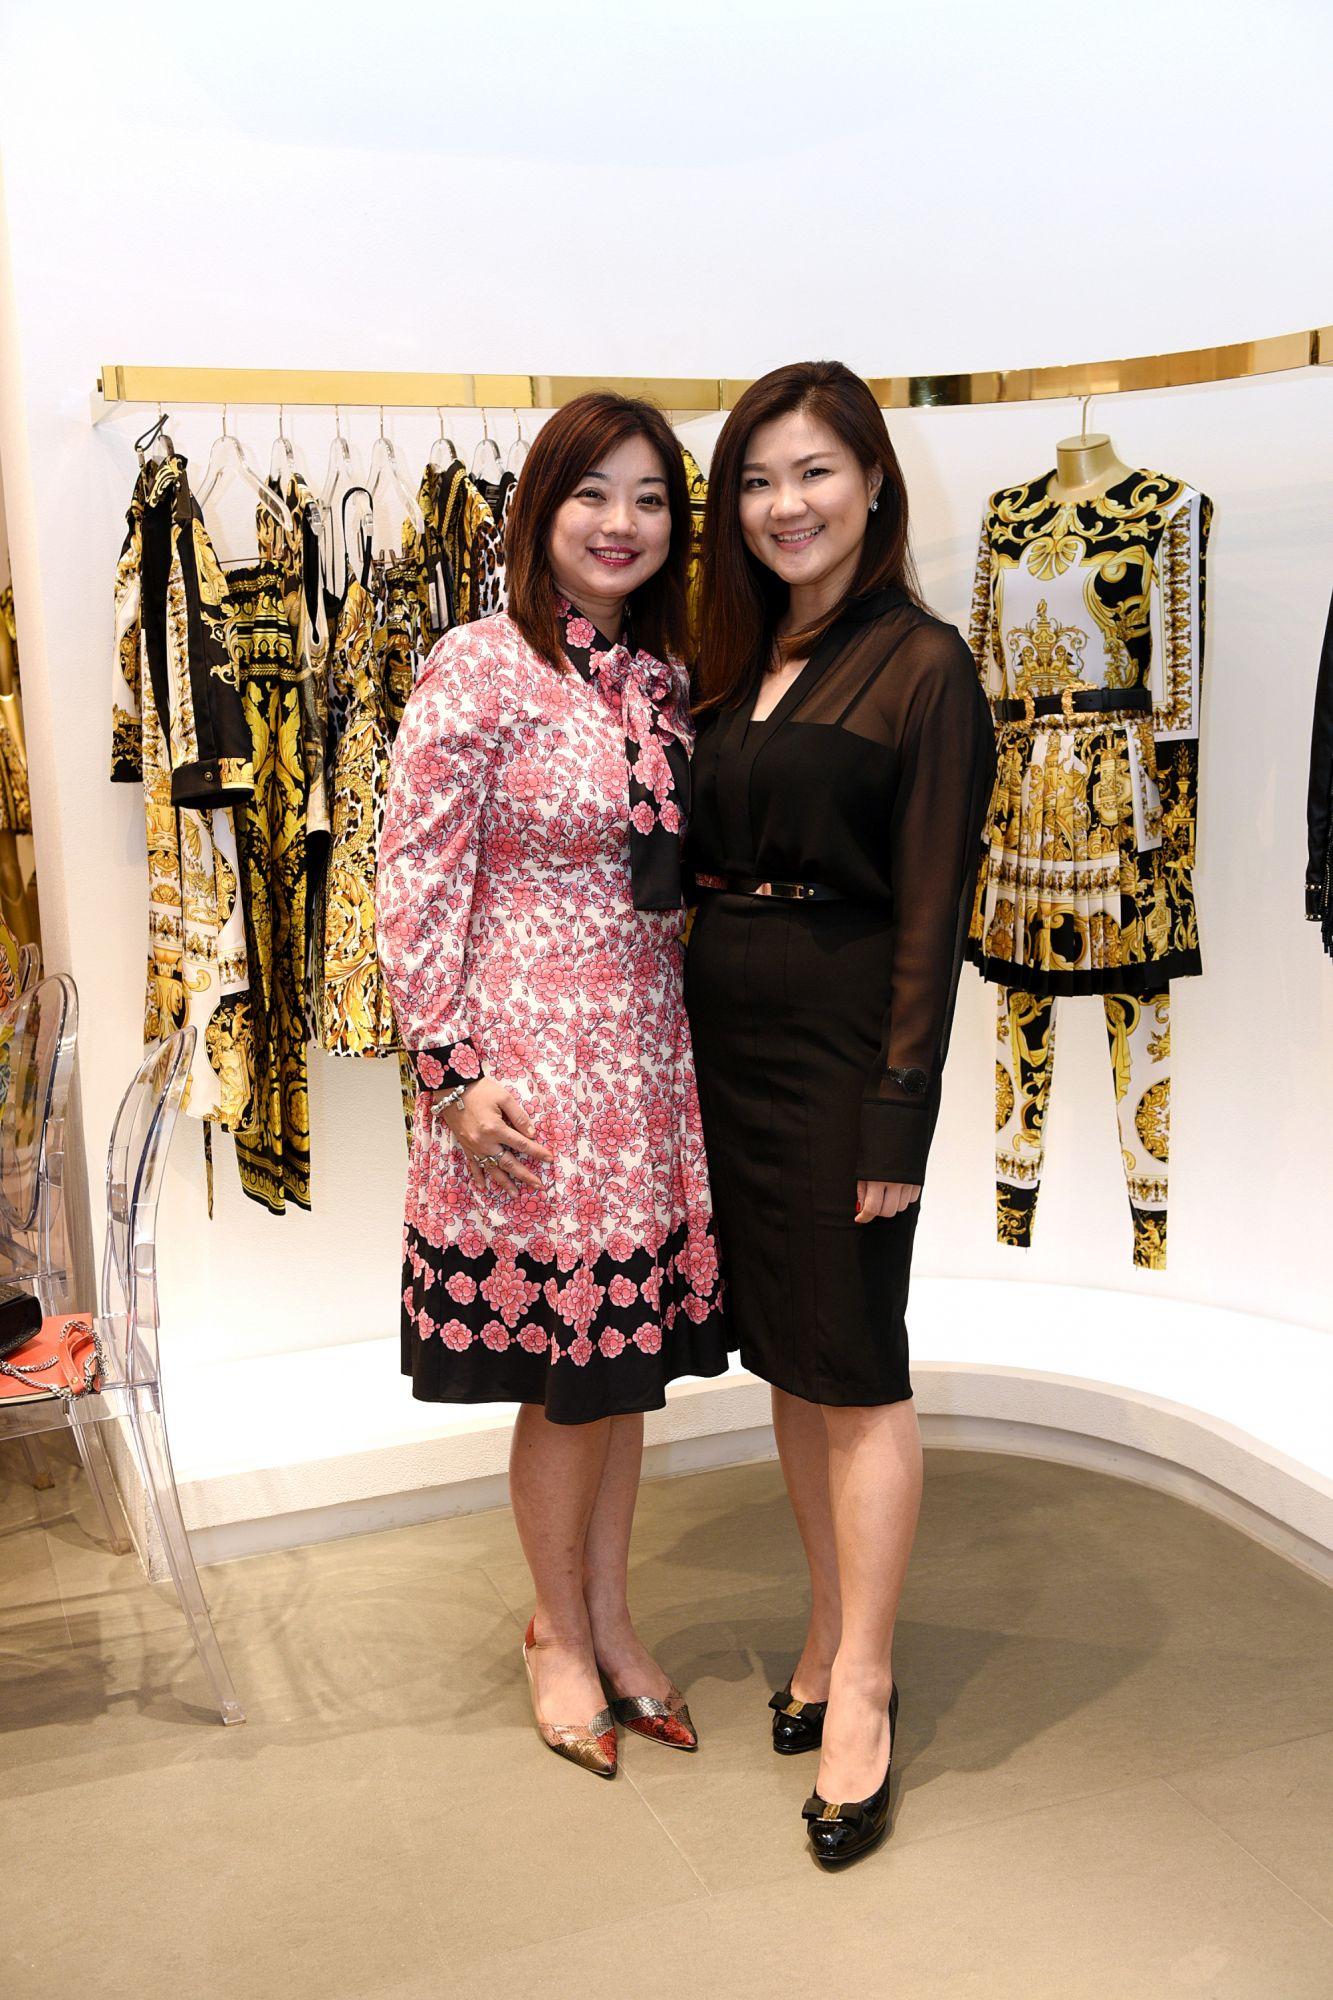 Mah Ching Cheng, Daphne Wang